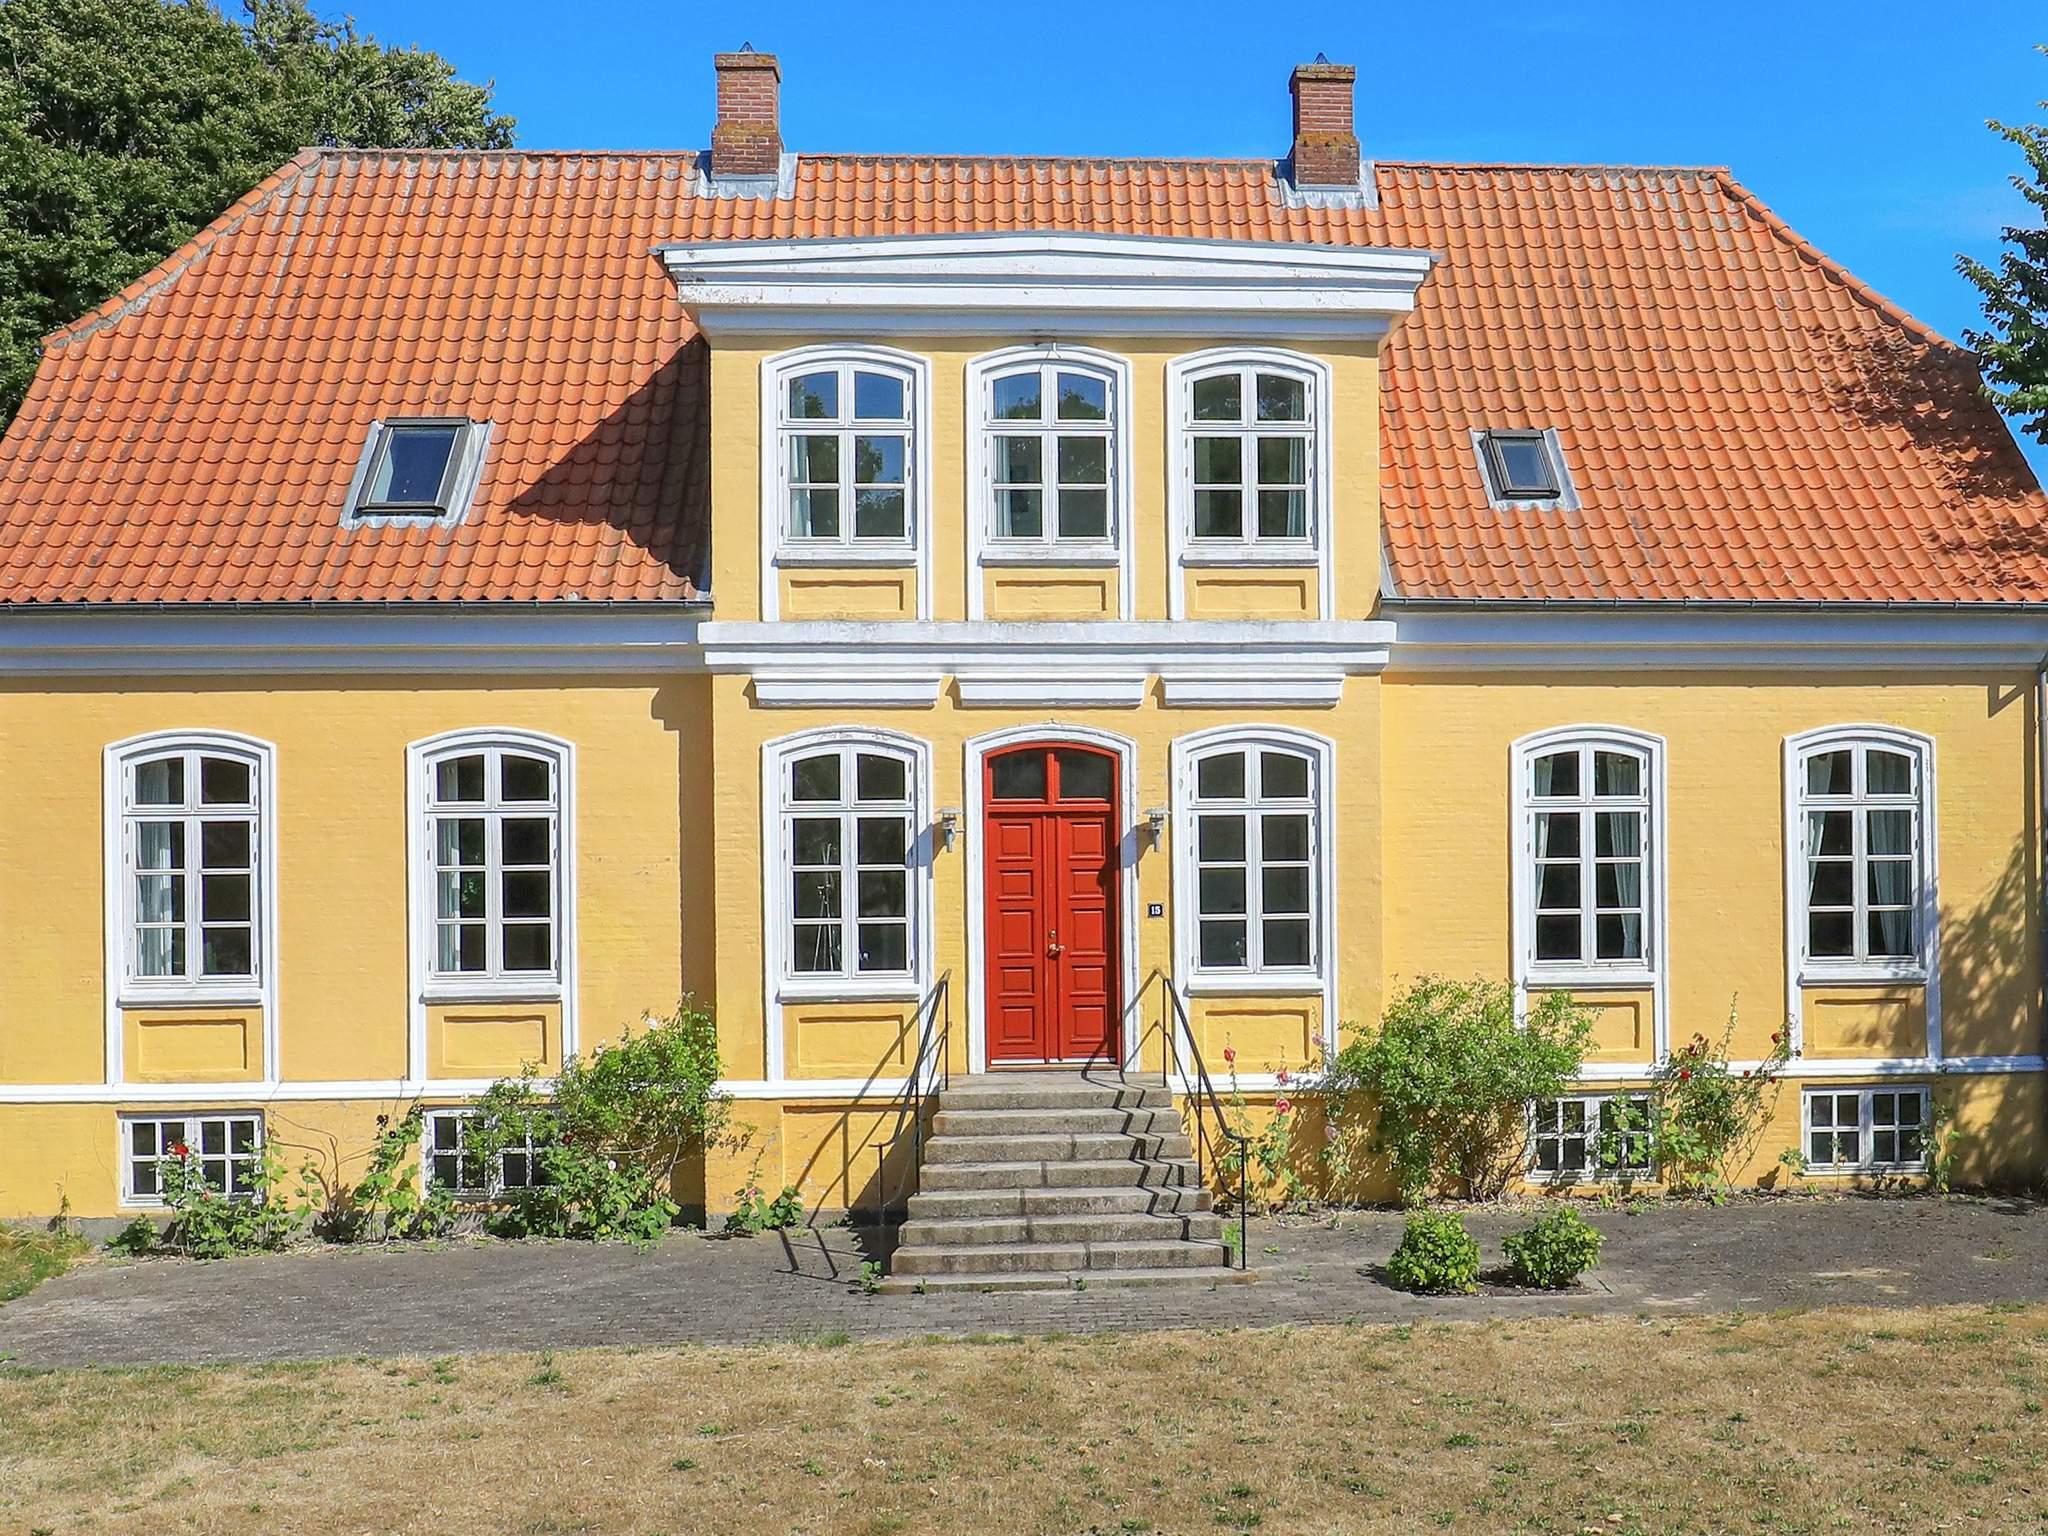 Ferienhaus Bukkemose (2453155), Humble, , Langeland, Dänemark, Bild 1